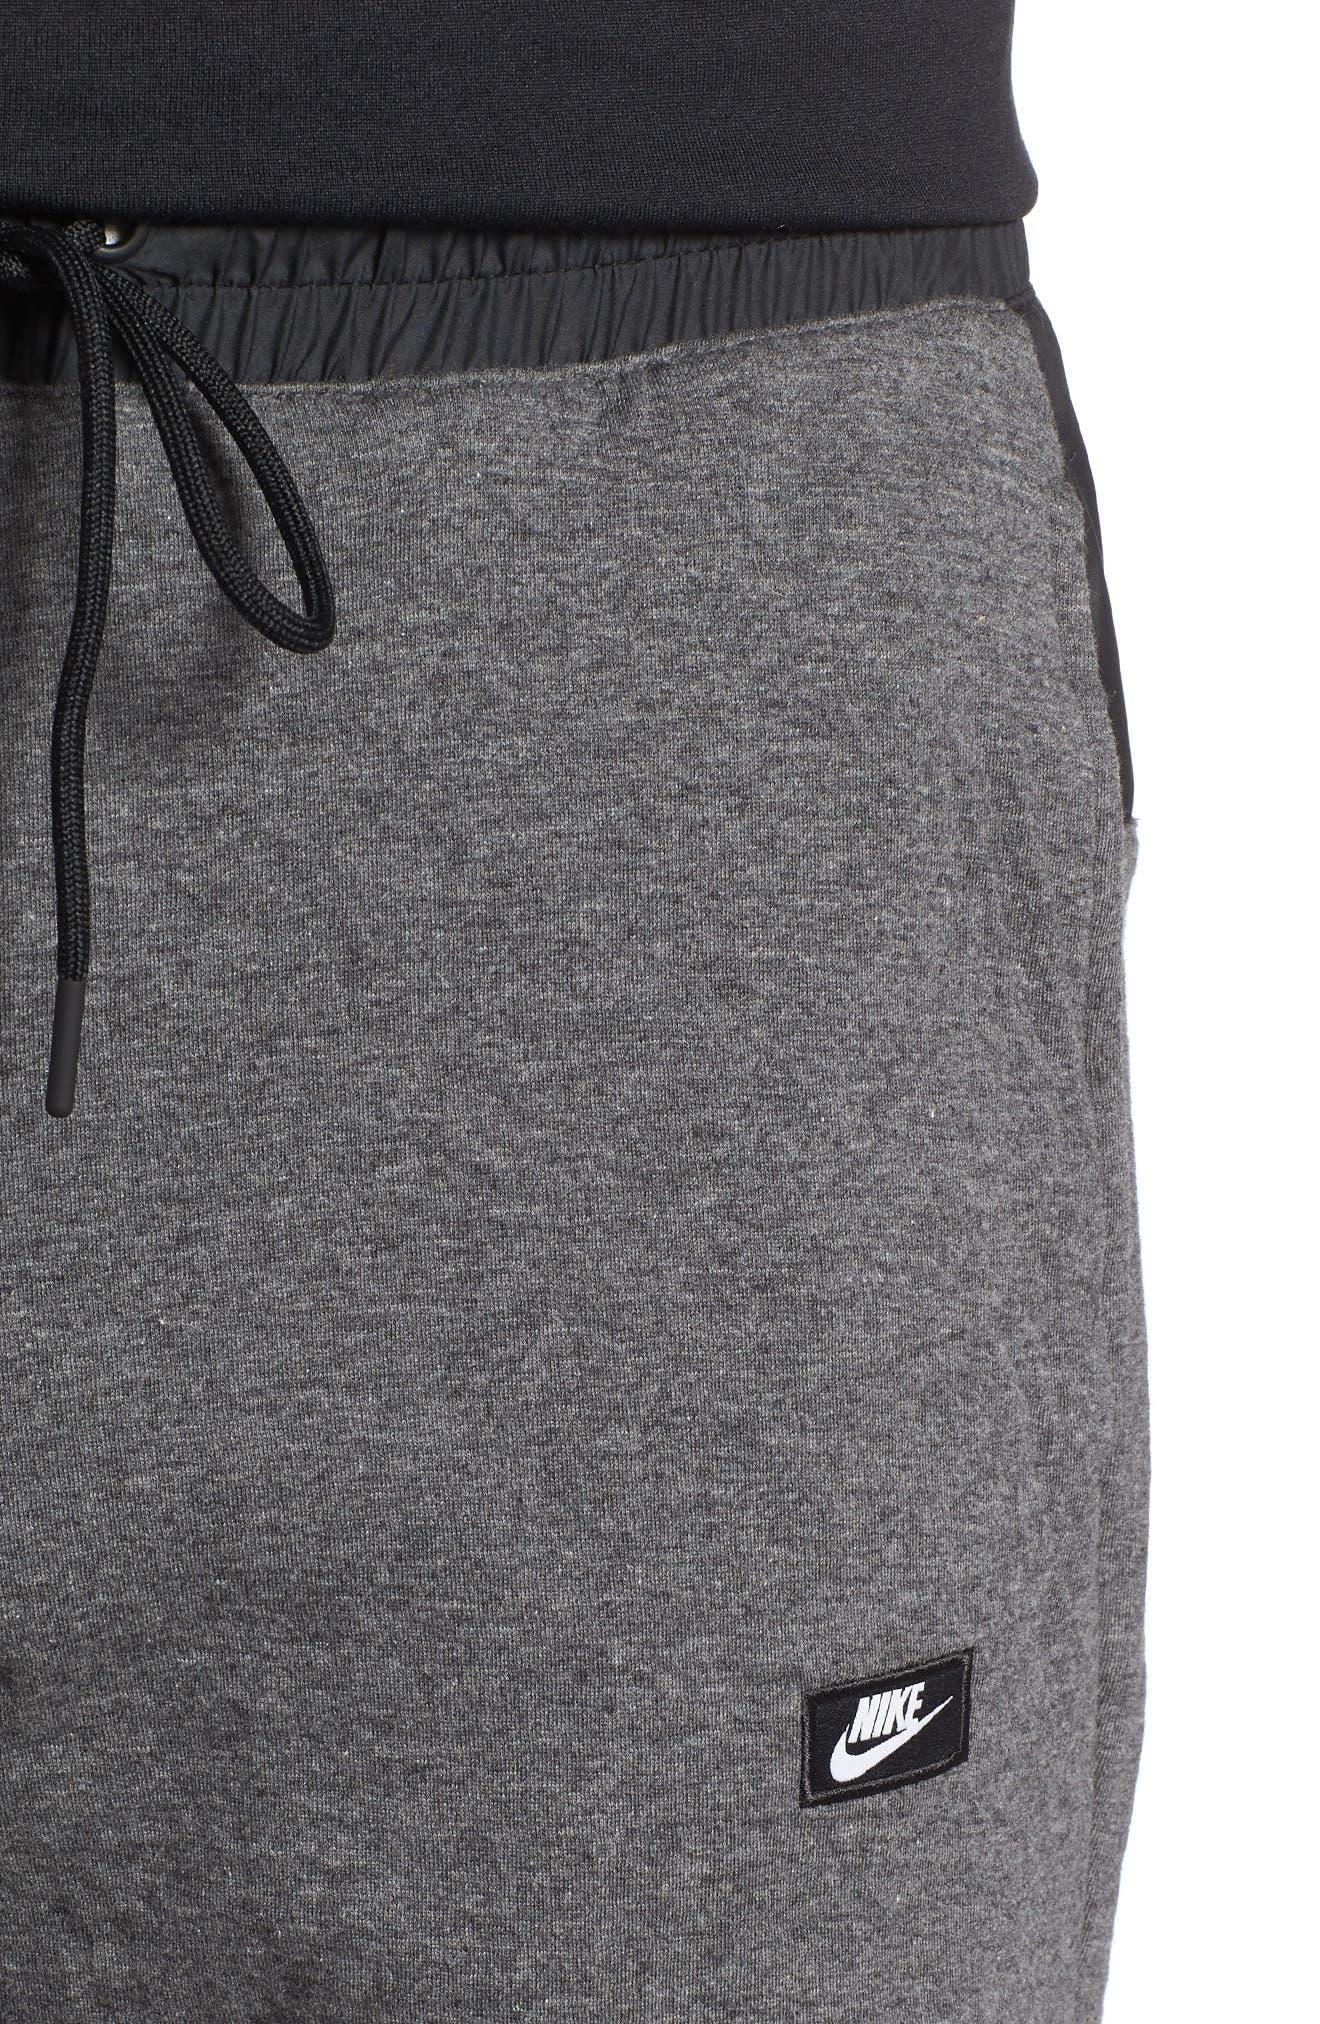 Sportswear Modern Shorts,                             Alternate thumbnail 4, color,                             Charcoal Heather/ Black